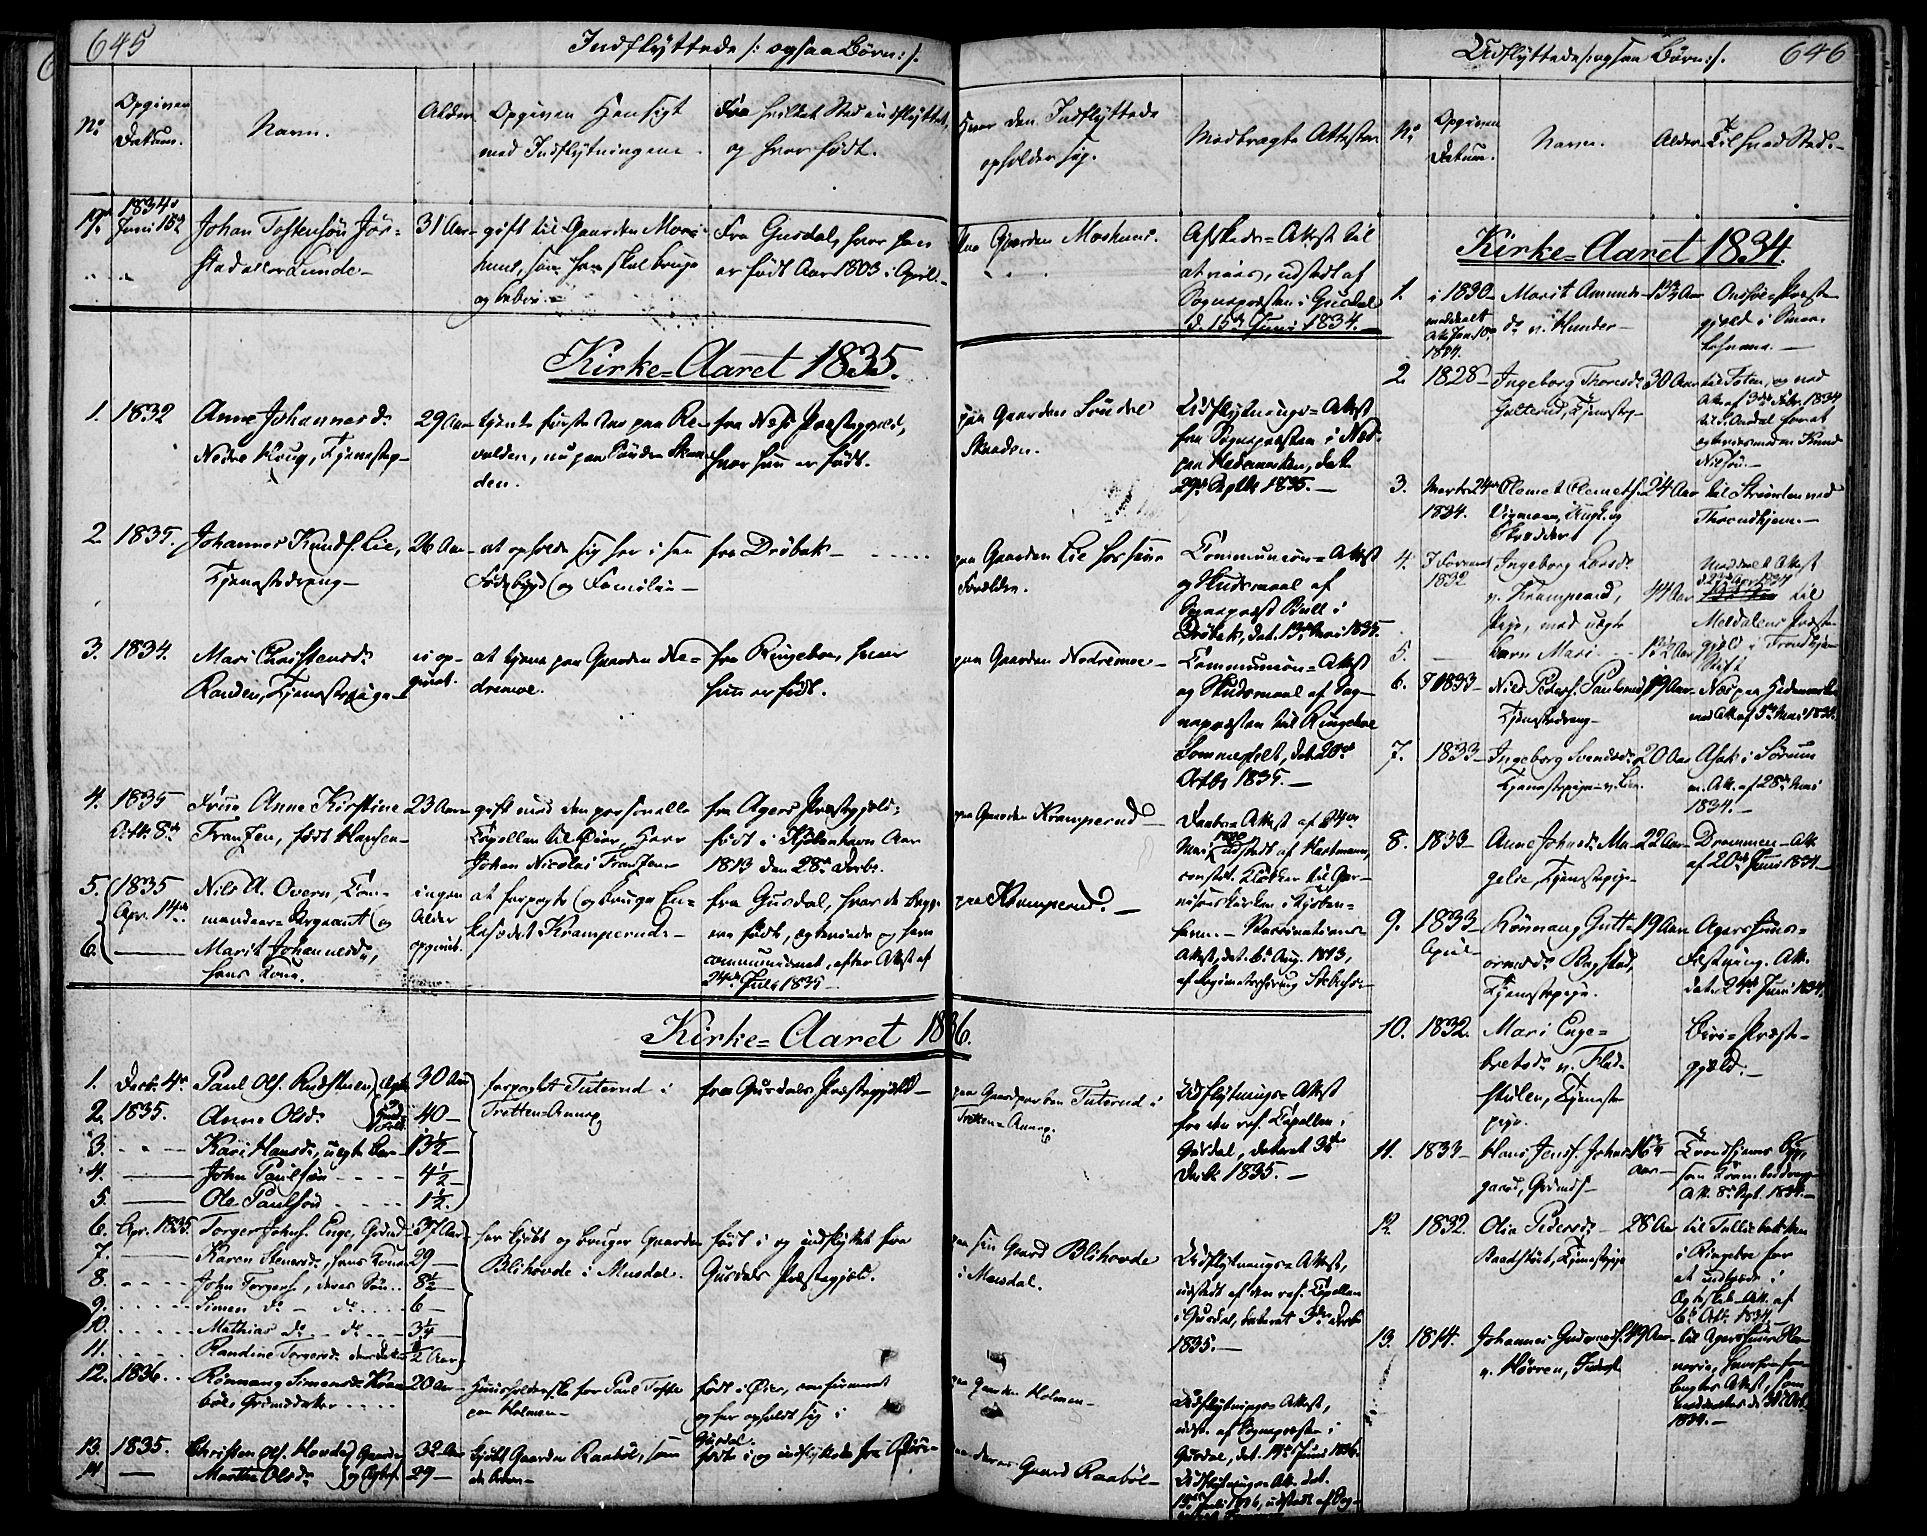 SAH, Øyer prestekontor, Ministerialbok nr. 4, 1824-1841, s. 645-646